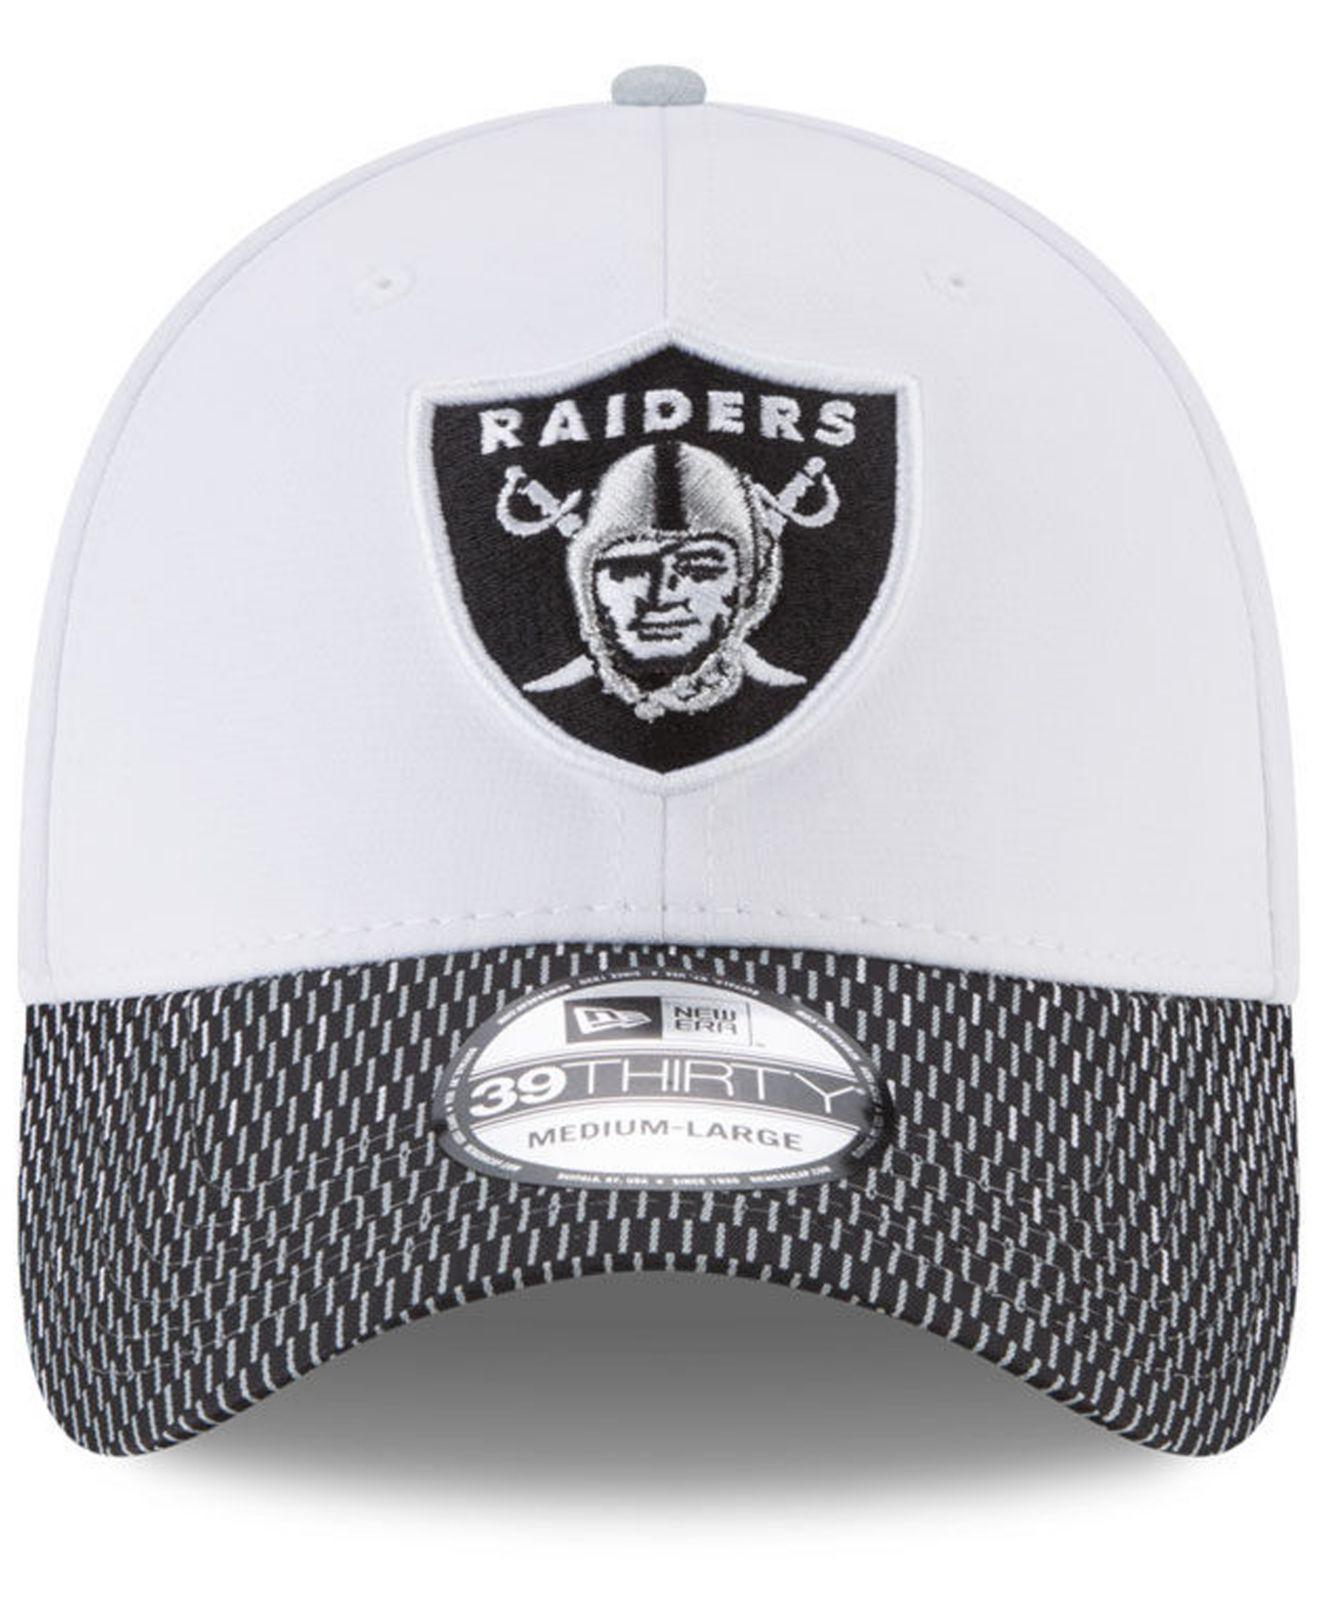 5f064eba4 Lyst - Ktz Oakland Raiders Equalizer 39thirty Cap in White for Men